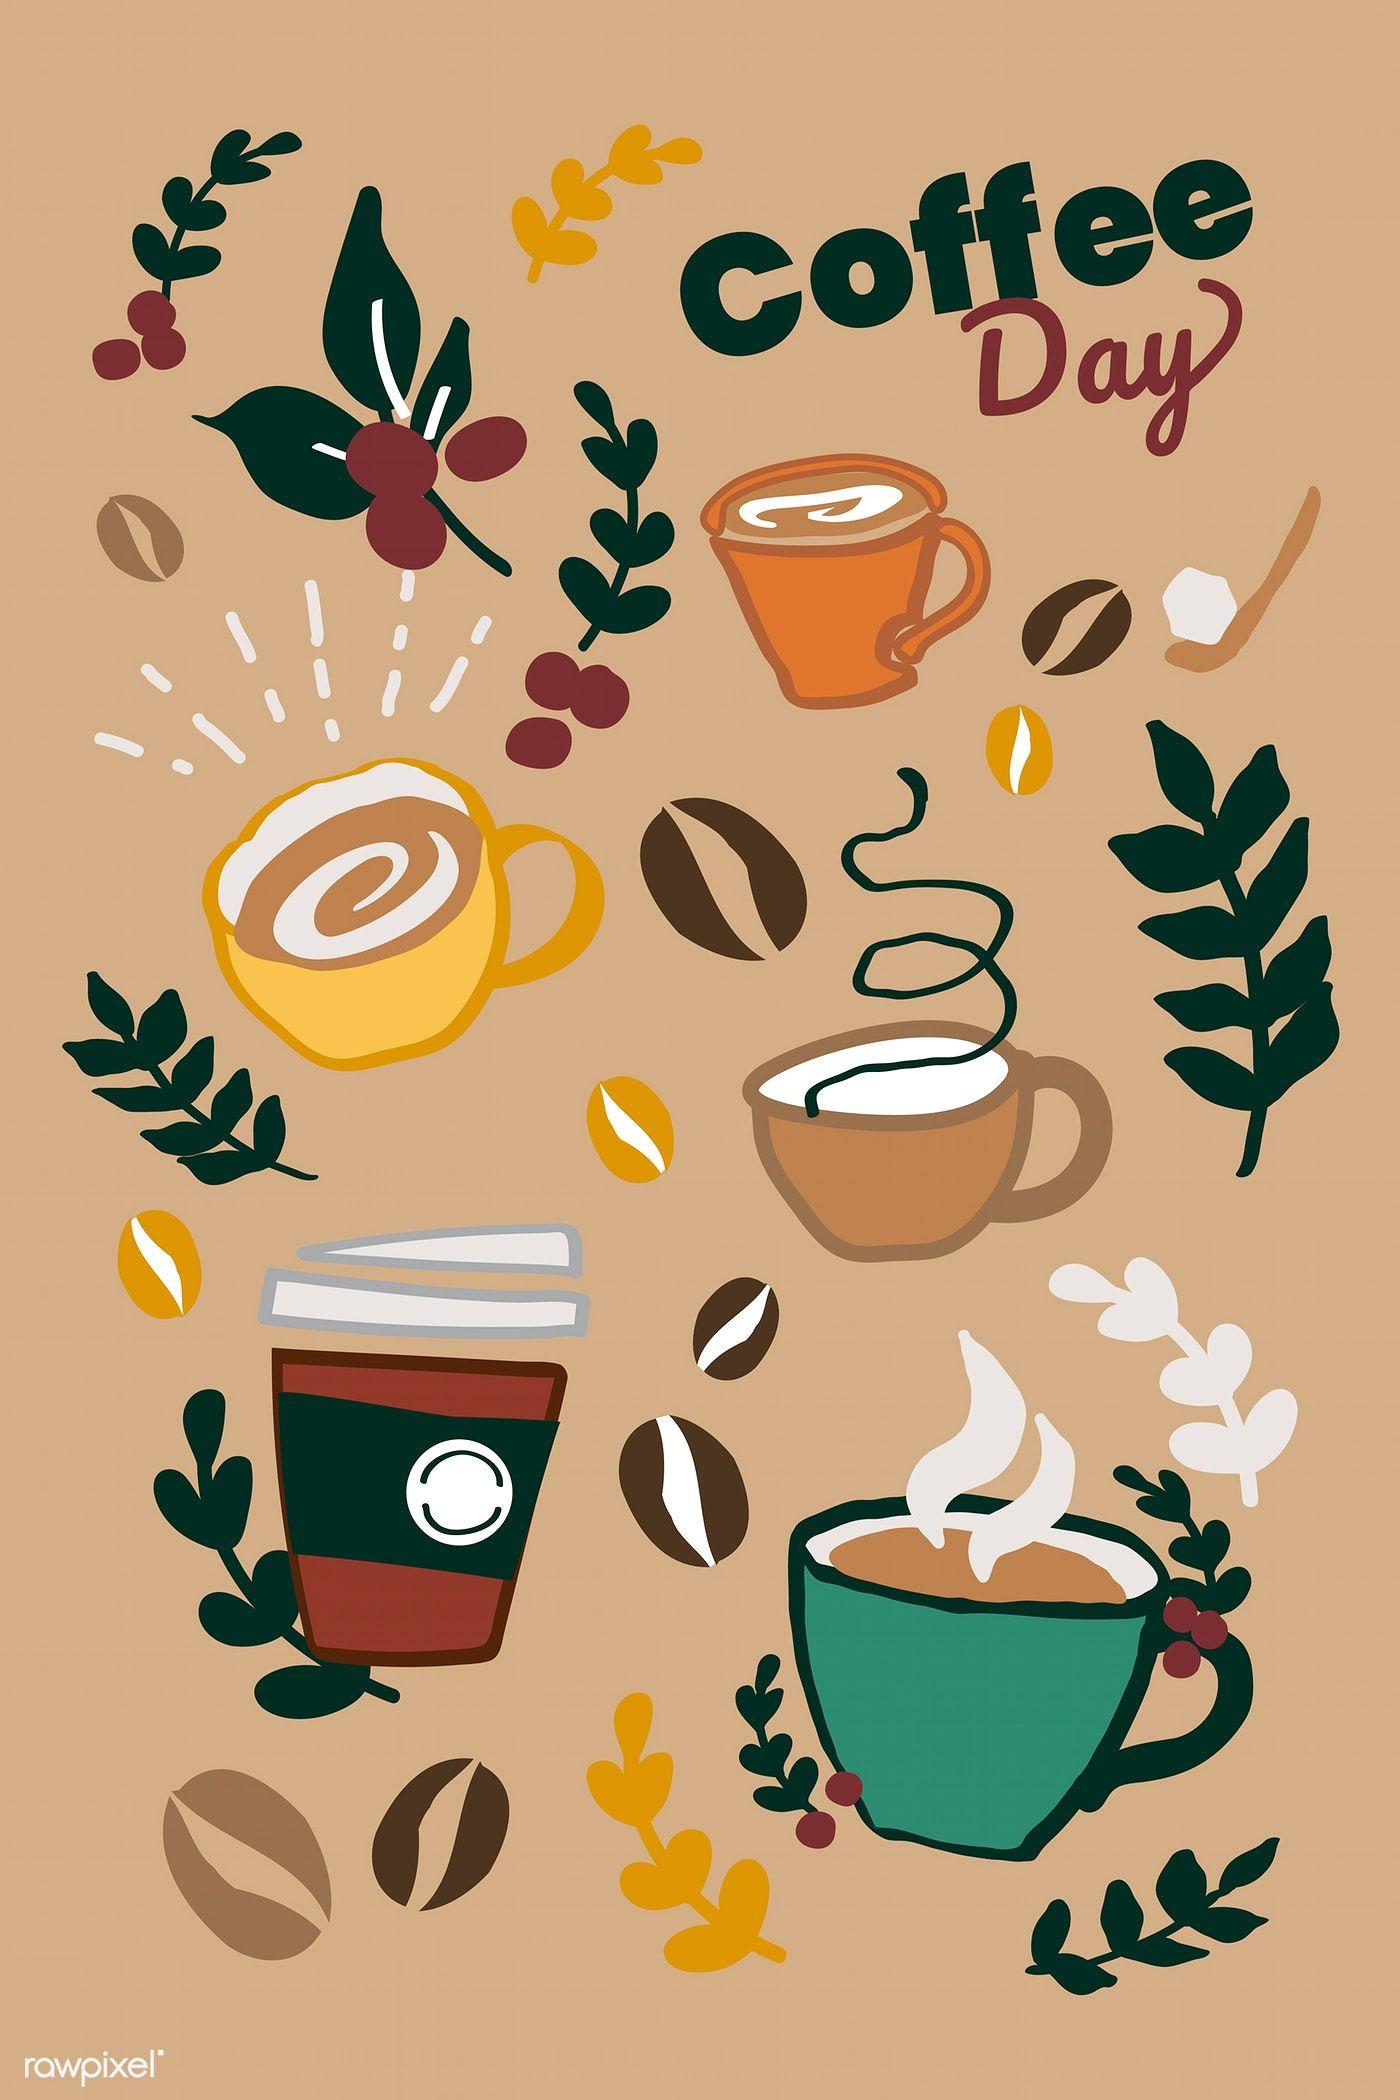 Snow Day Campfire Mug Mugs, Cute coffee mugs, Christmas mugs